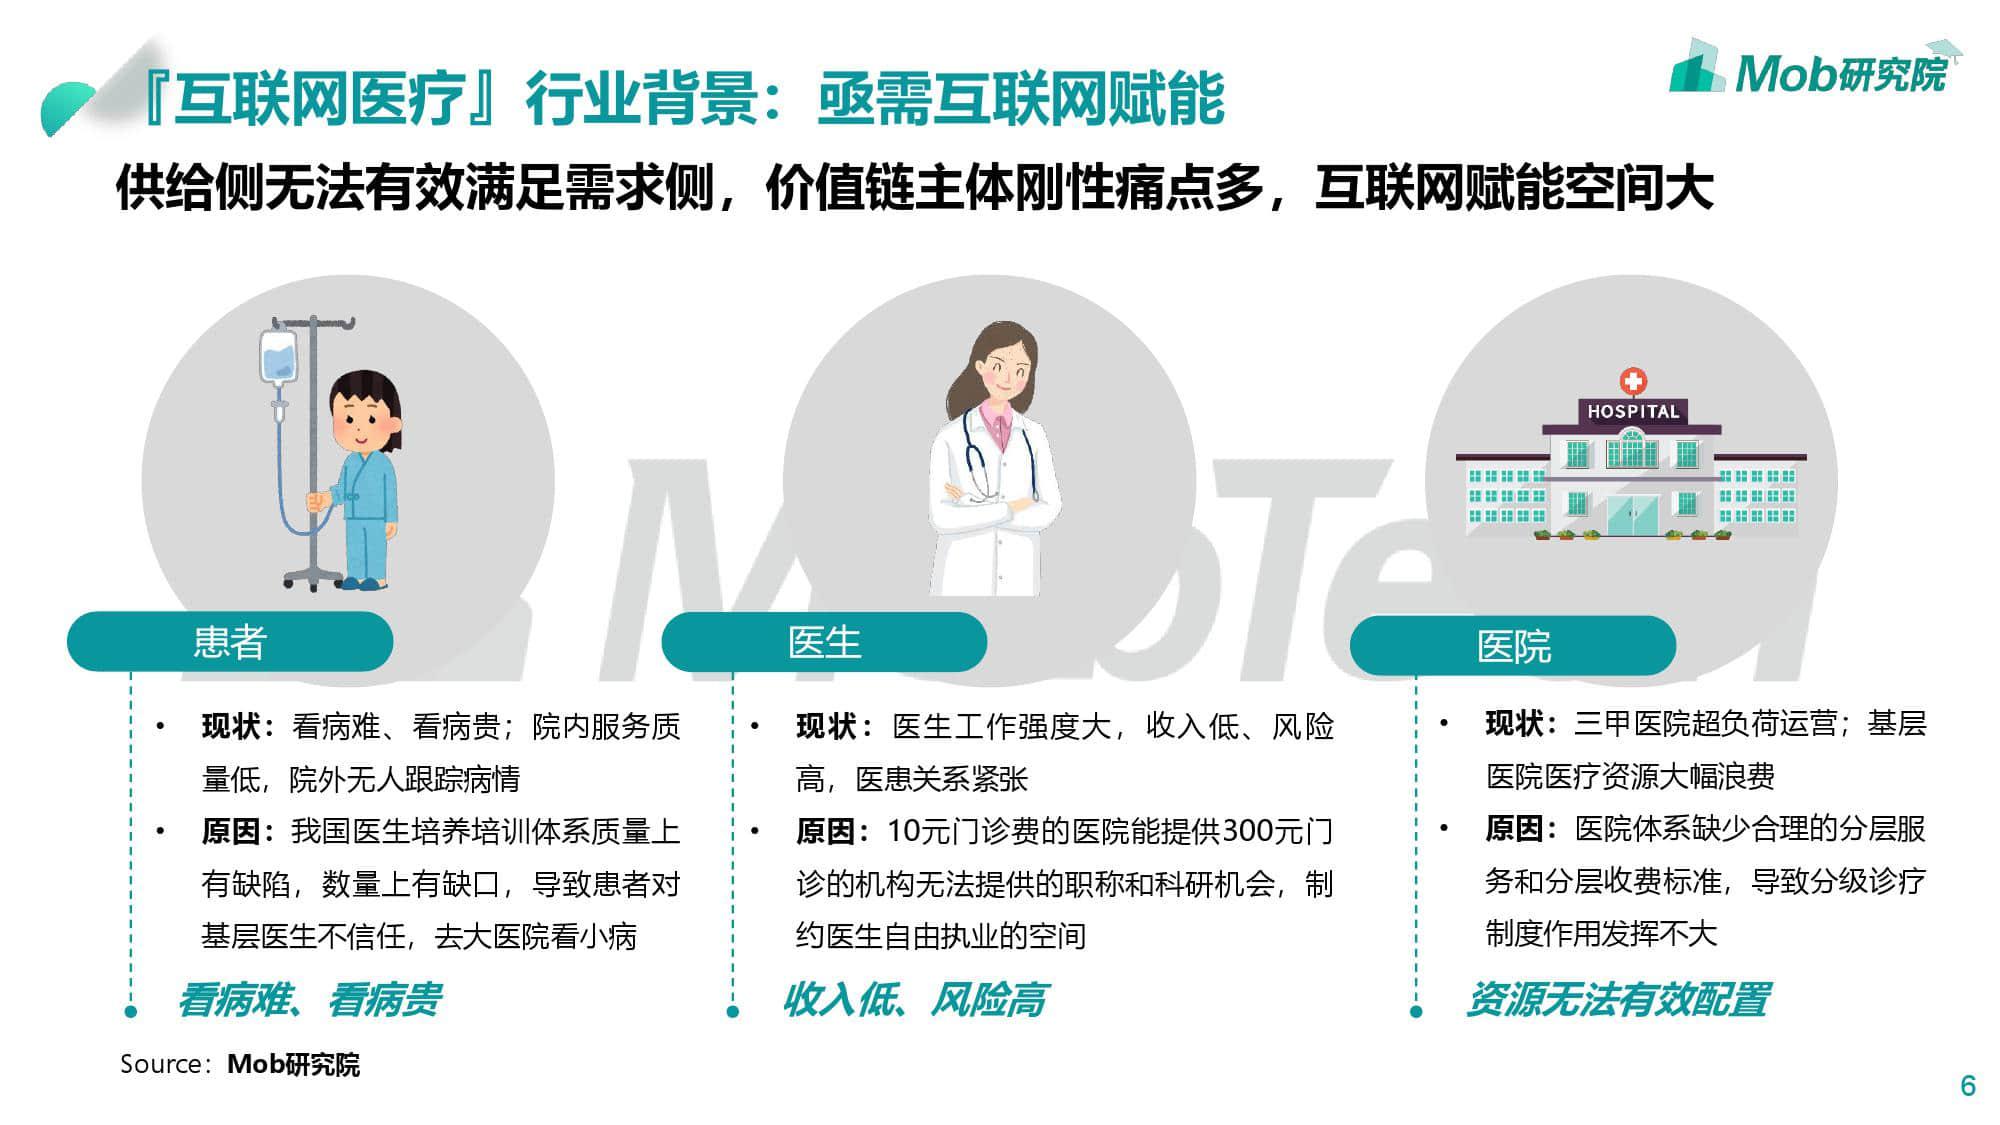 Mob研究院:2019互联网医疗行业洞察报告(199it)